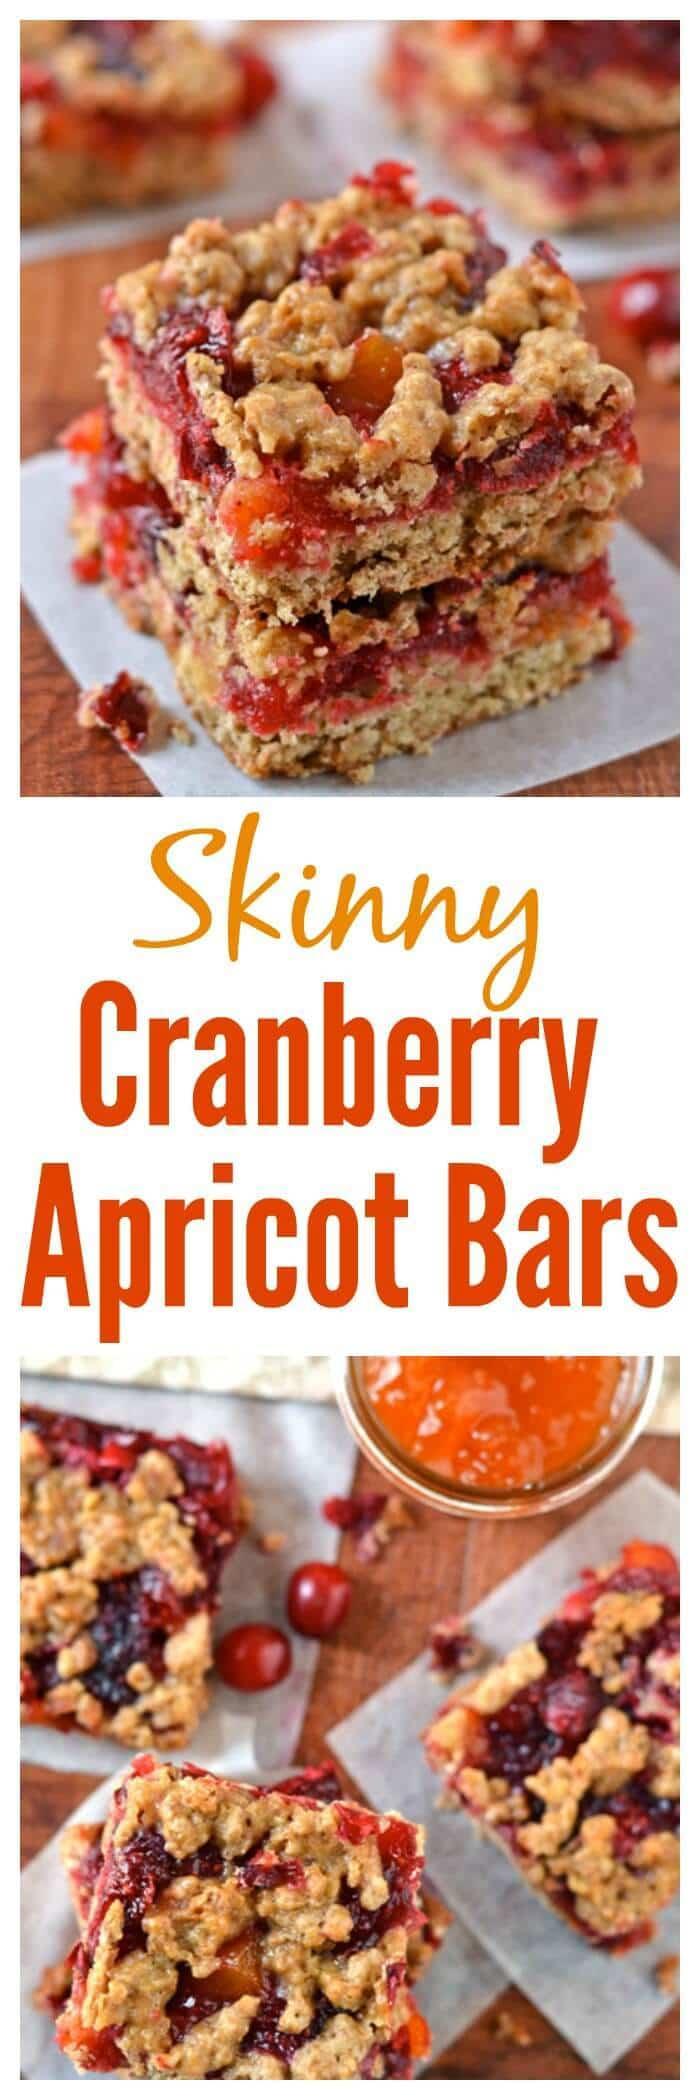 Skinny Cranberry Apricot Bars